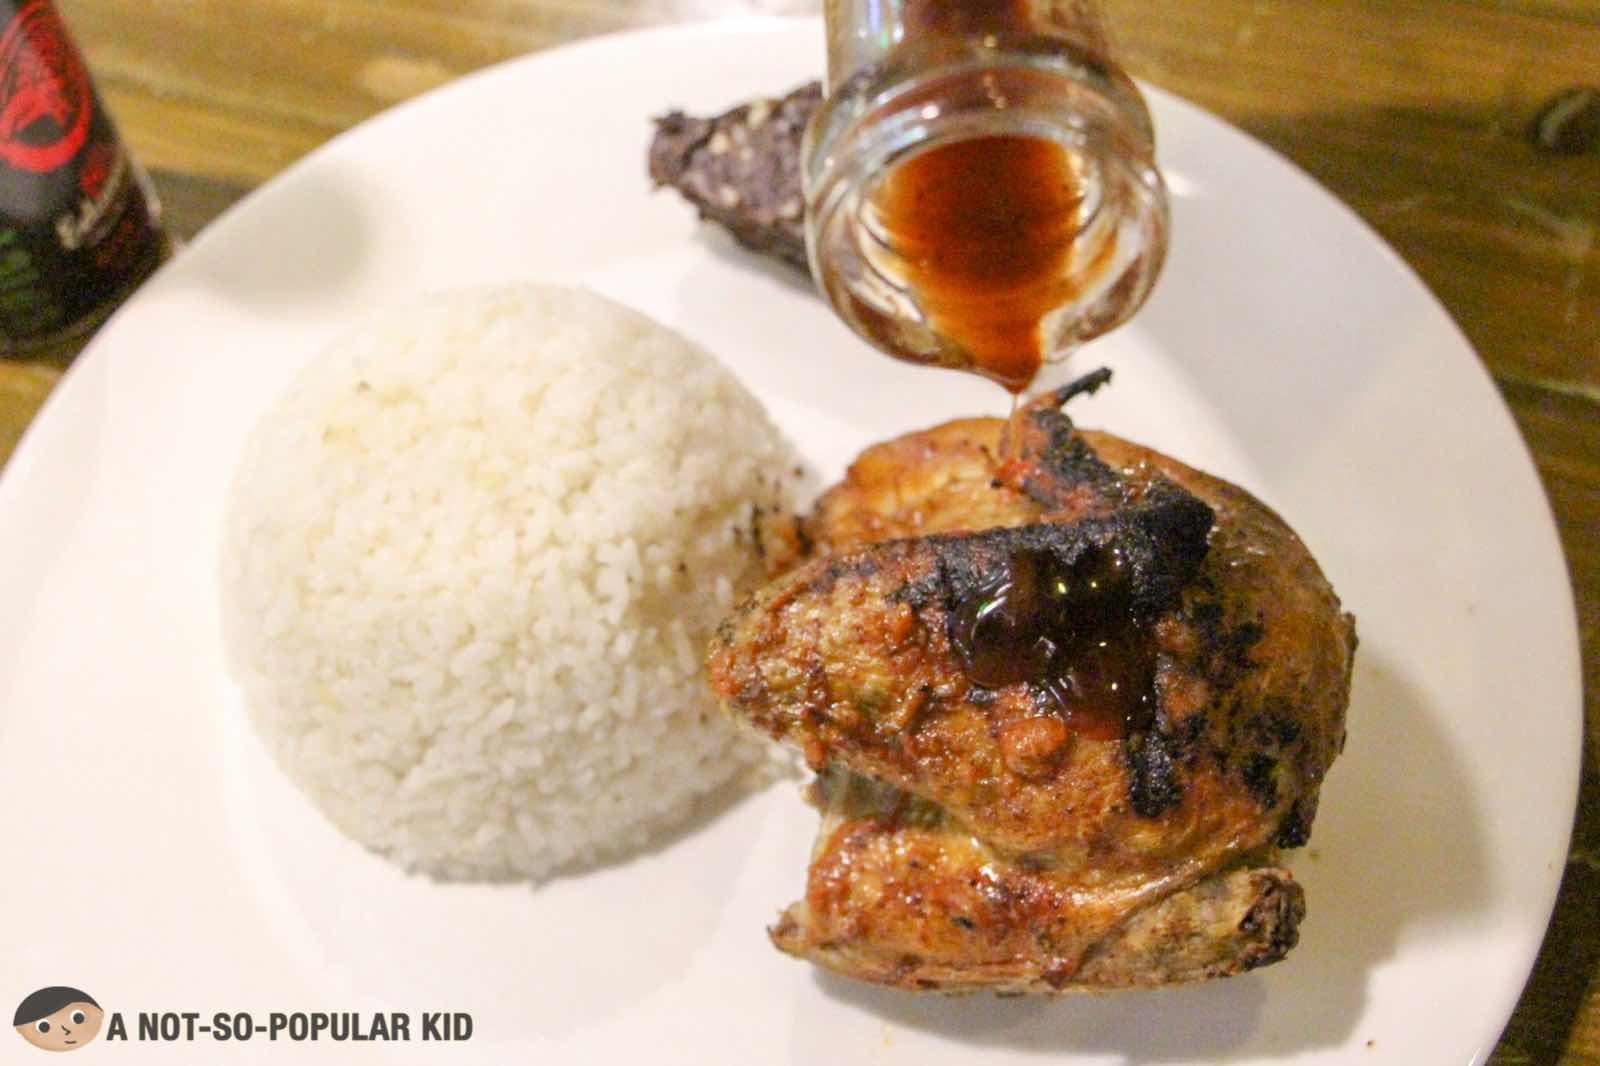 Quarter Chicken Meal of Eduardo's Peri-Peri